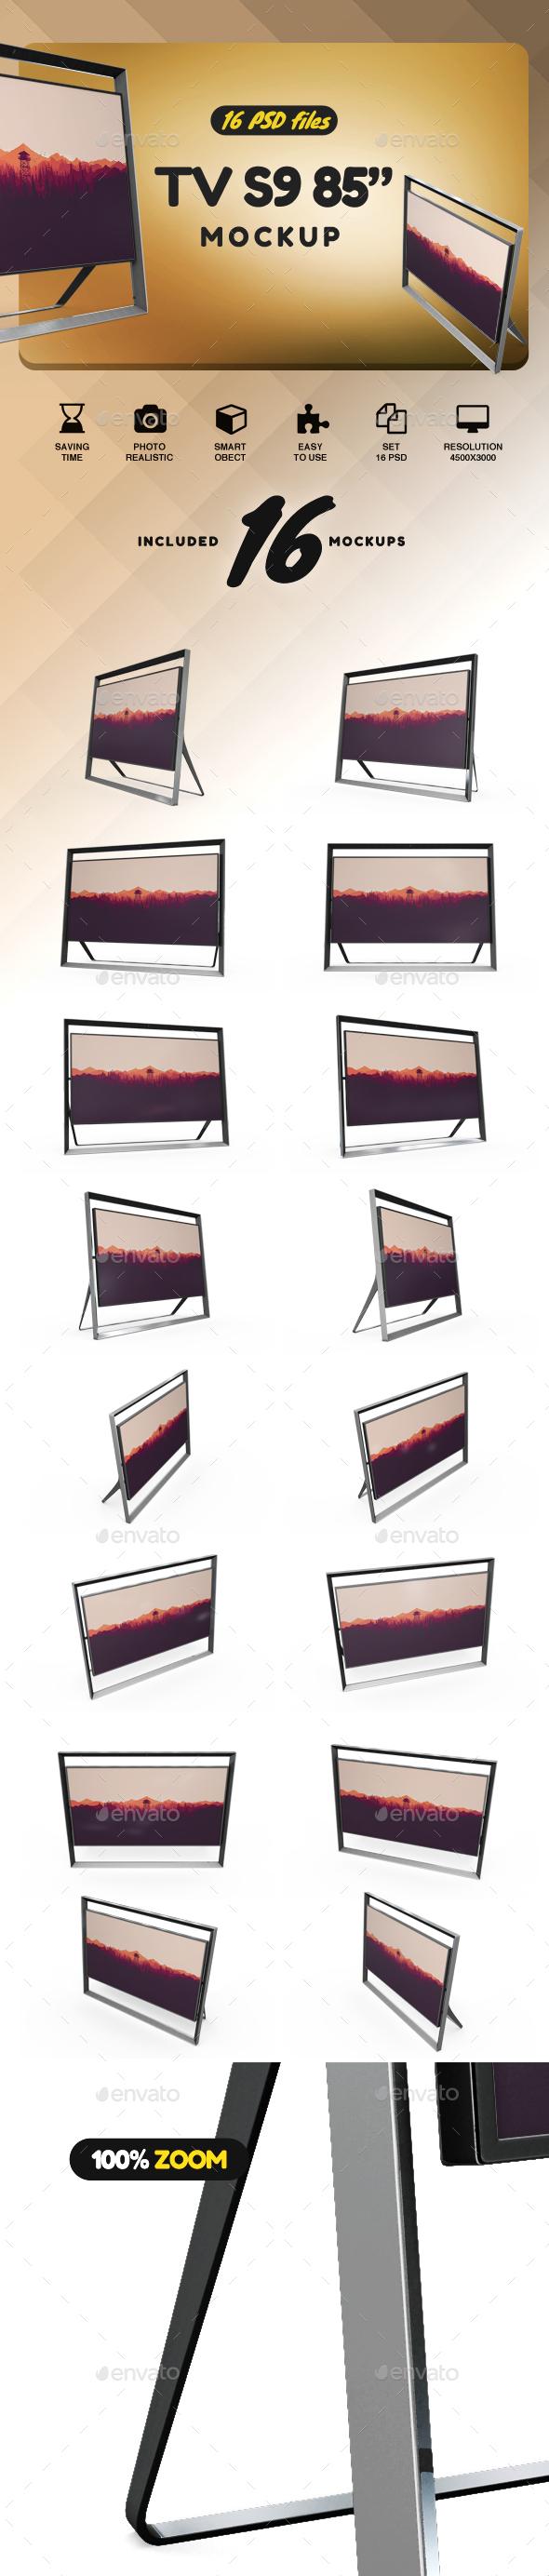 "85"" Smart Tv Mockup - TV Displays"